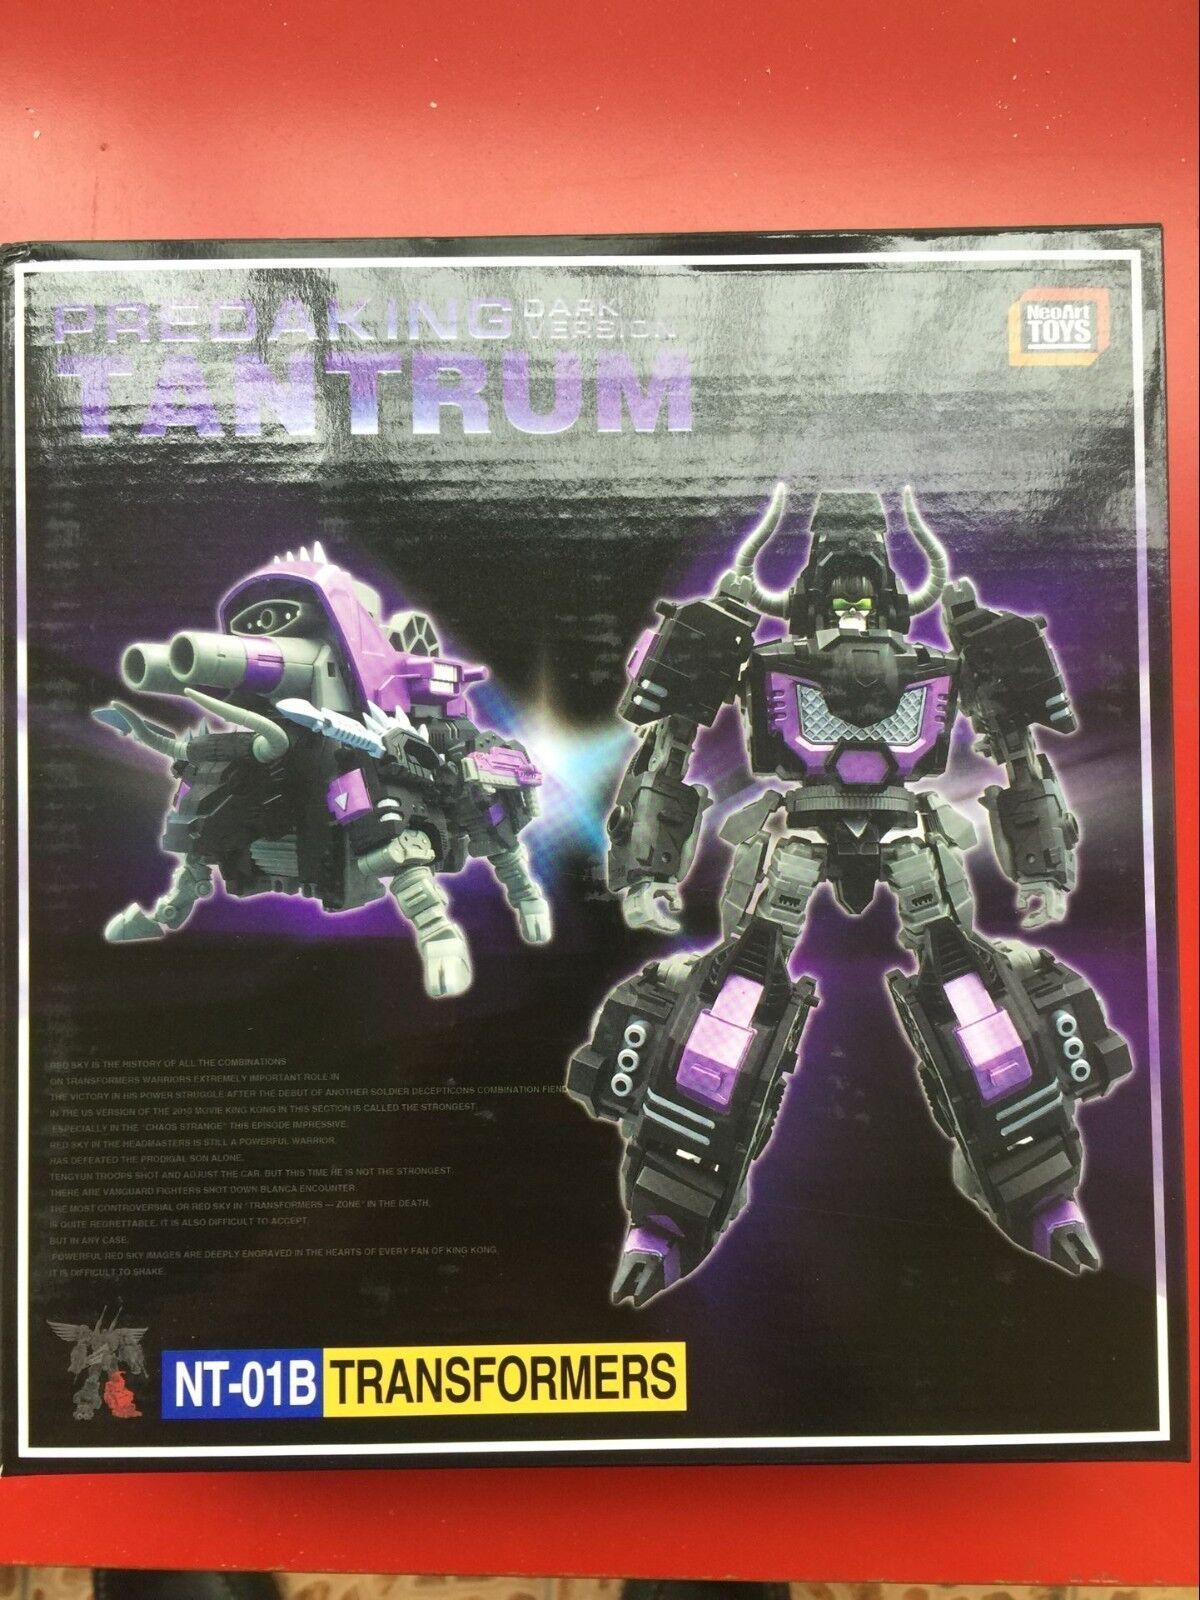 NeroArt giocattoli NT-01B & NT02B Prossoare Tantcorrere & Headstrong